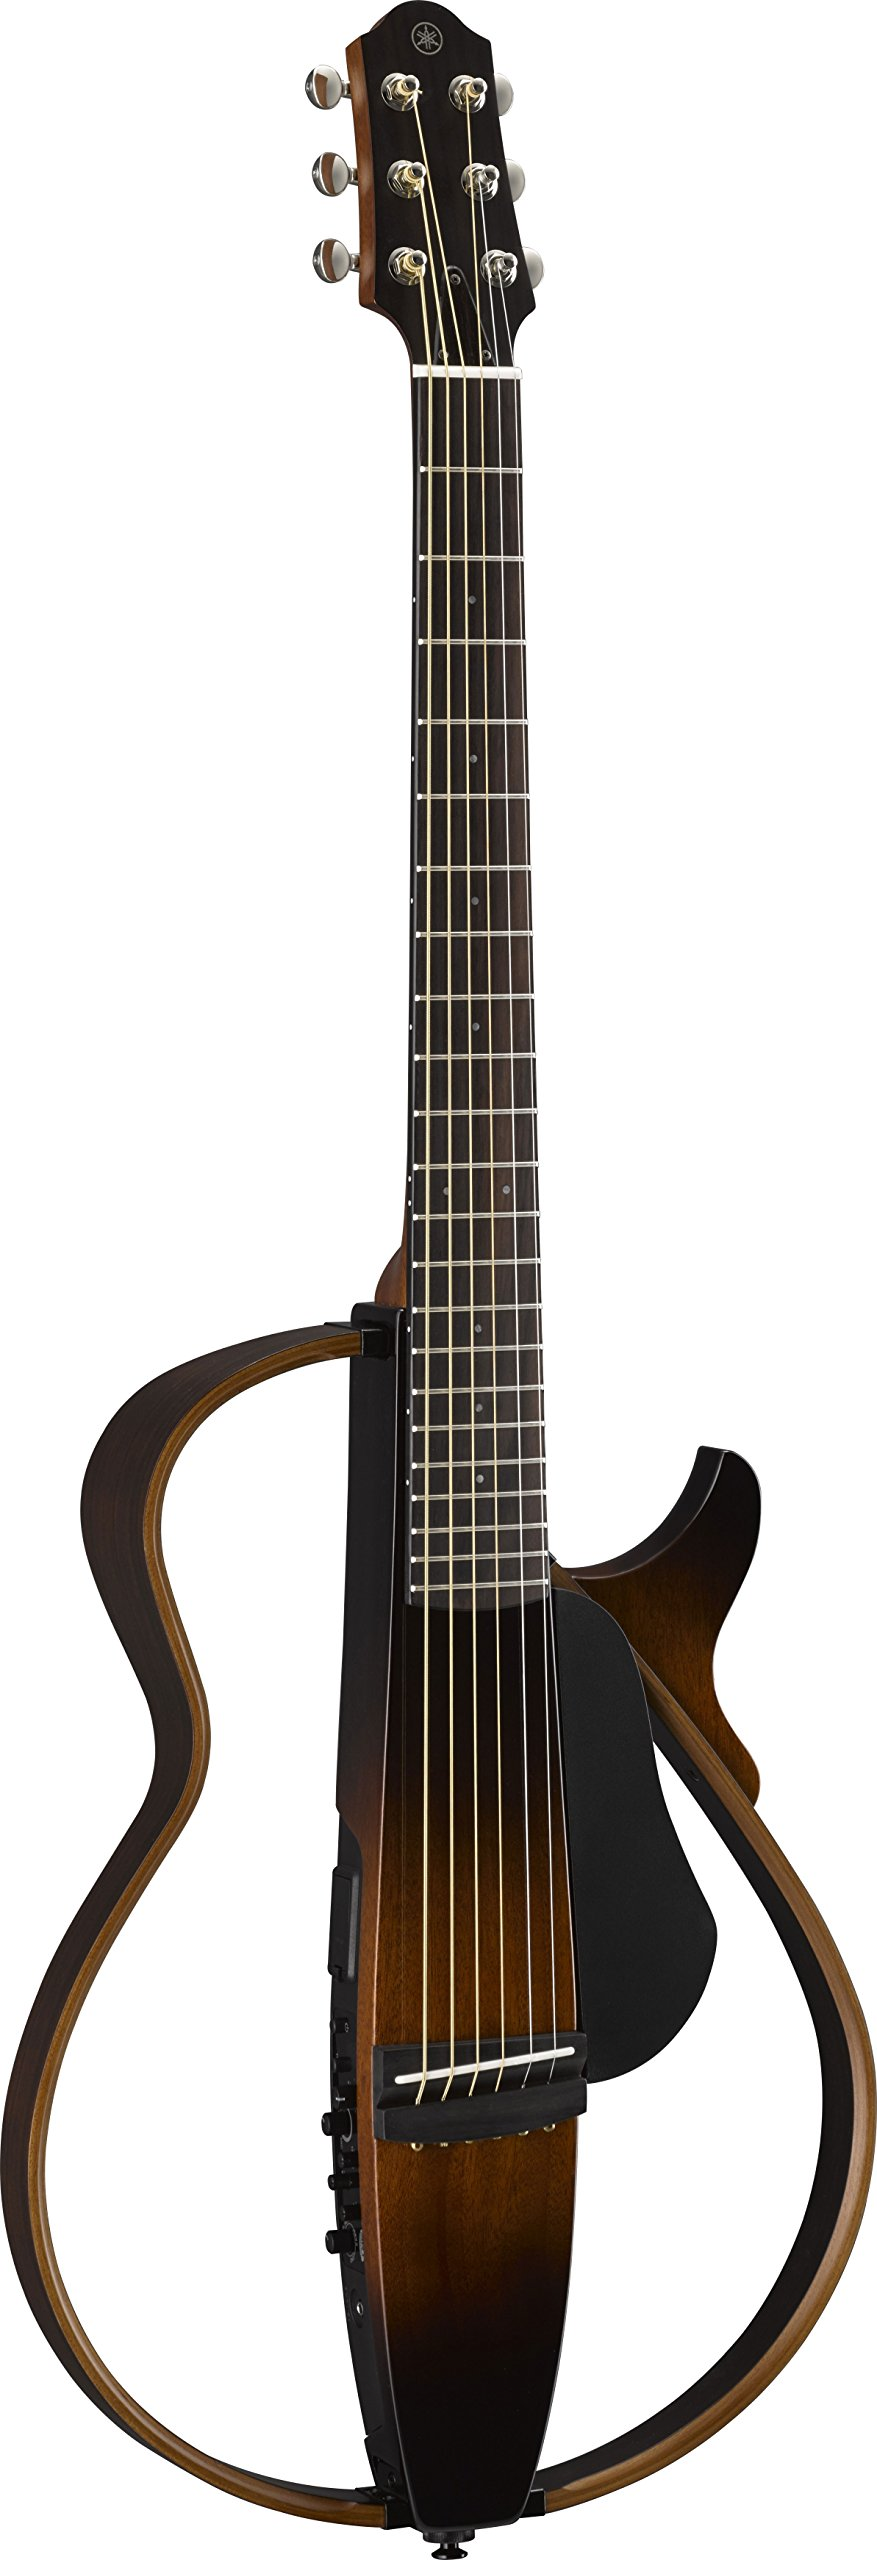 Cheap Yamaha Steel String Silent Guitar Tobacco Sunburst - SLG200S TBS Black Friday & Cyber Monday 2019